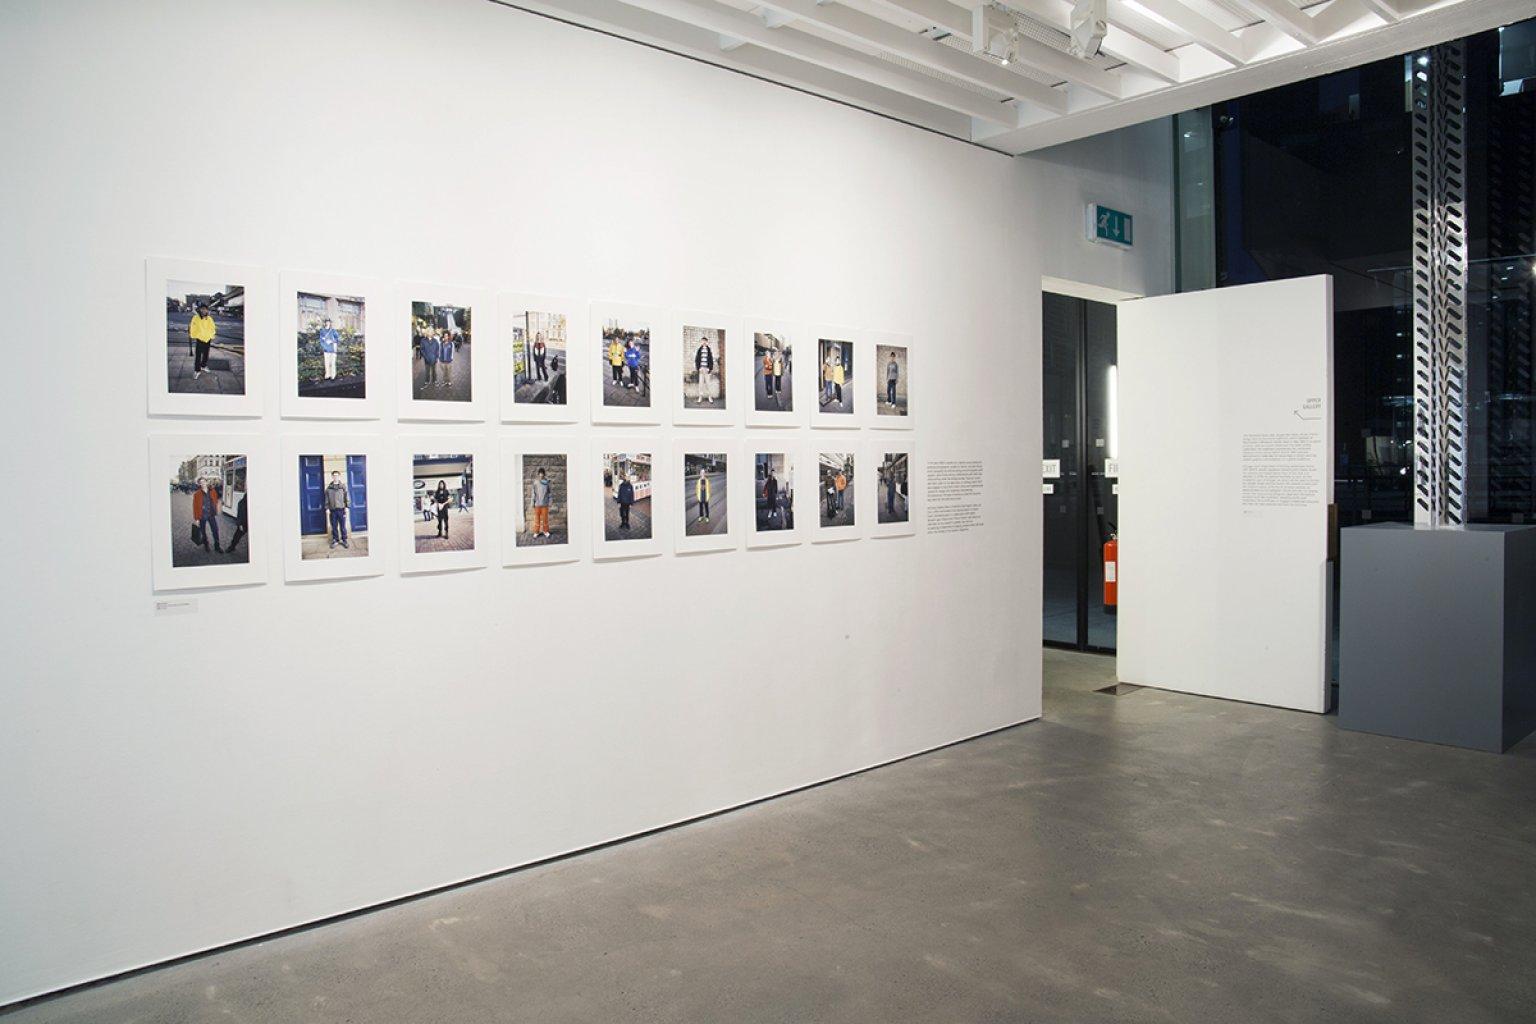 North: Identity, Photography, Fashion